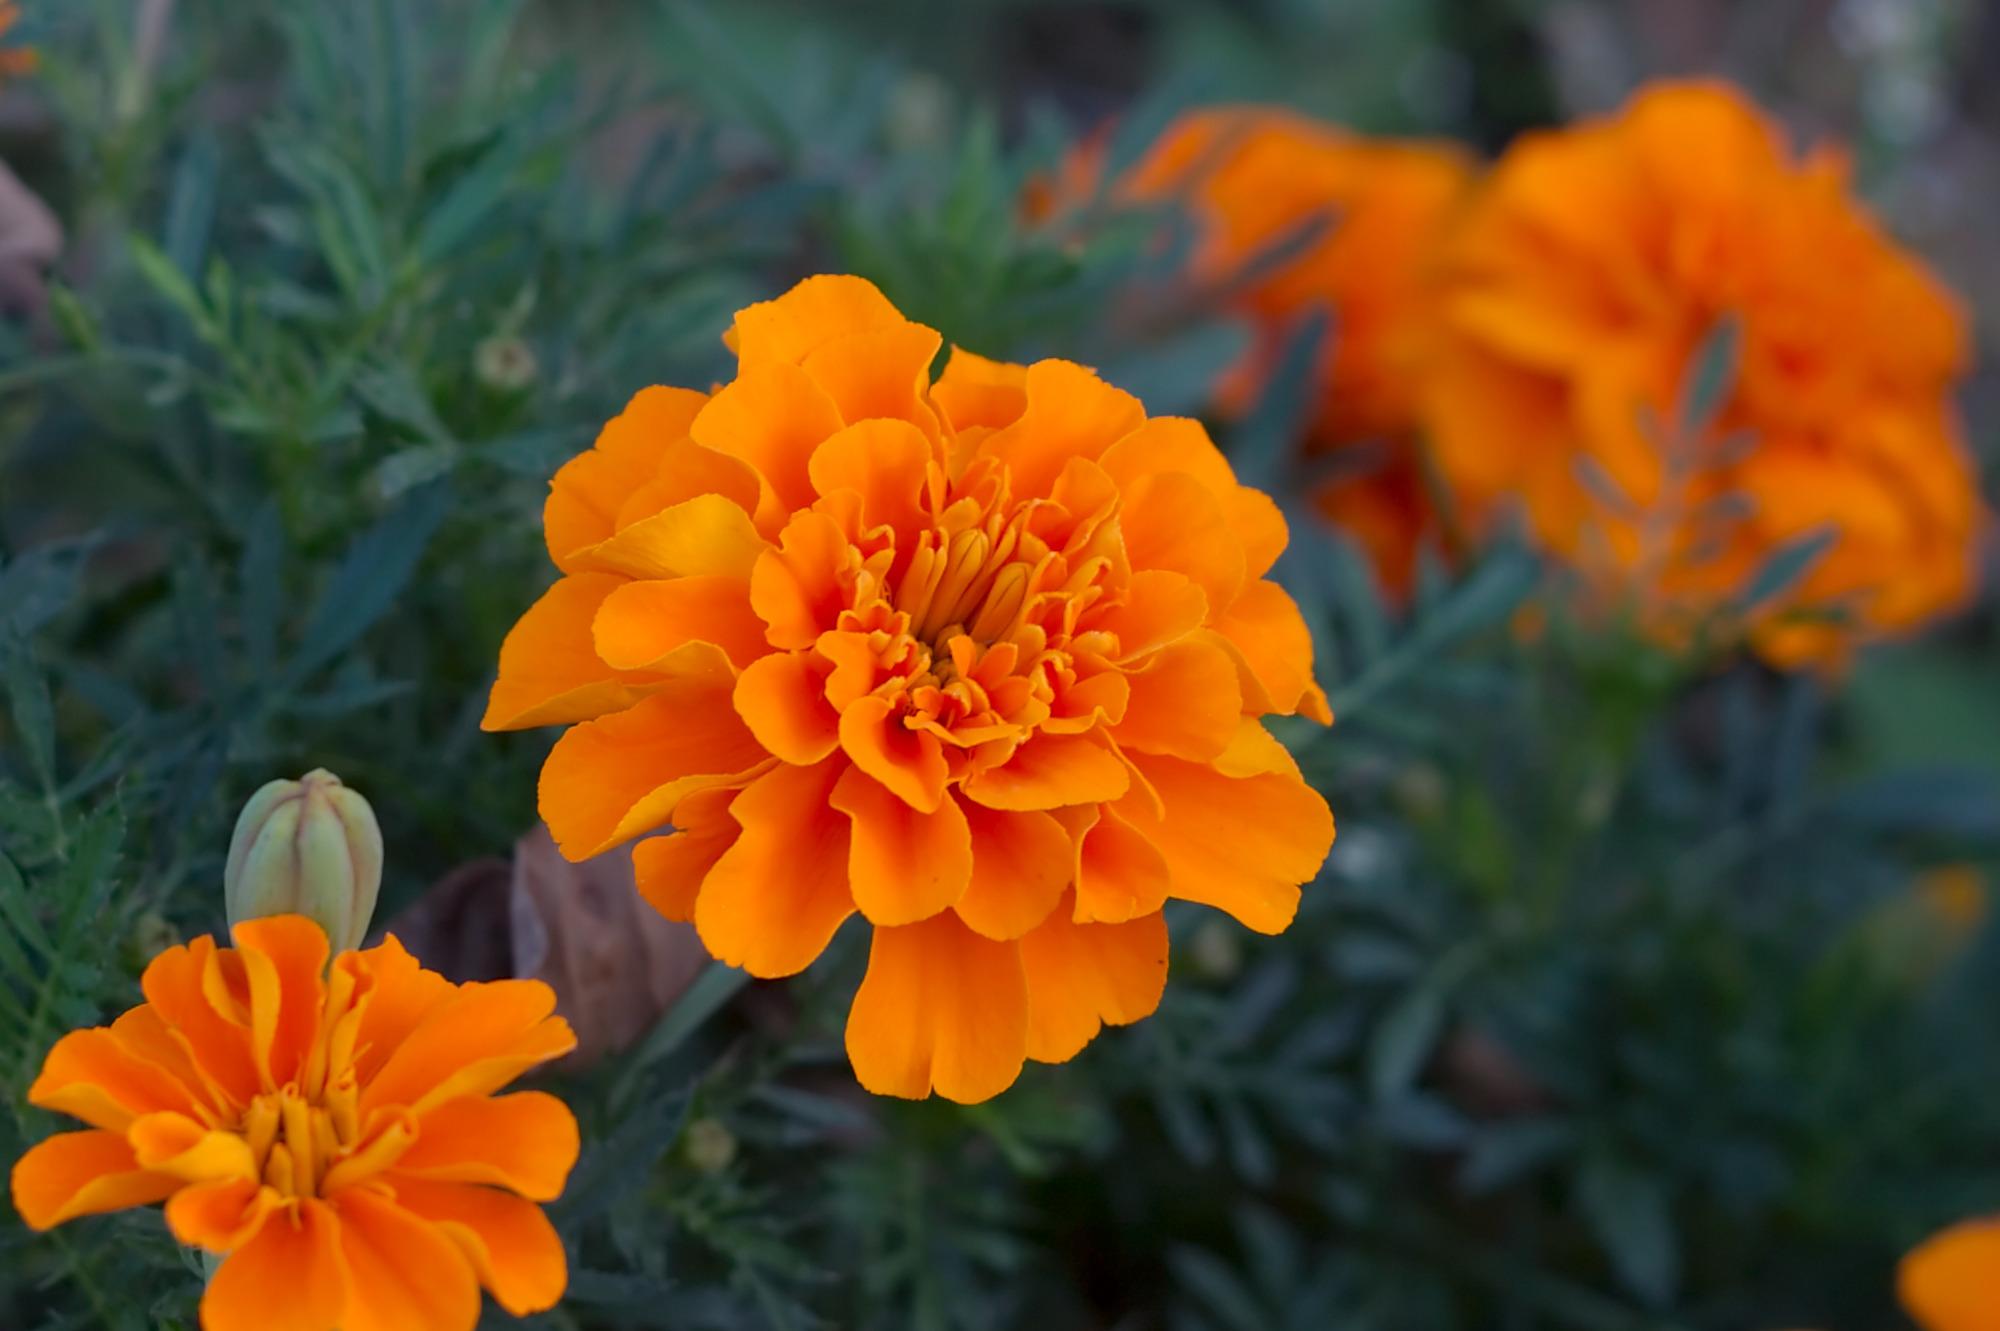 Tagetes. (Marigold).